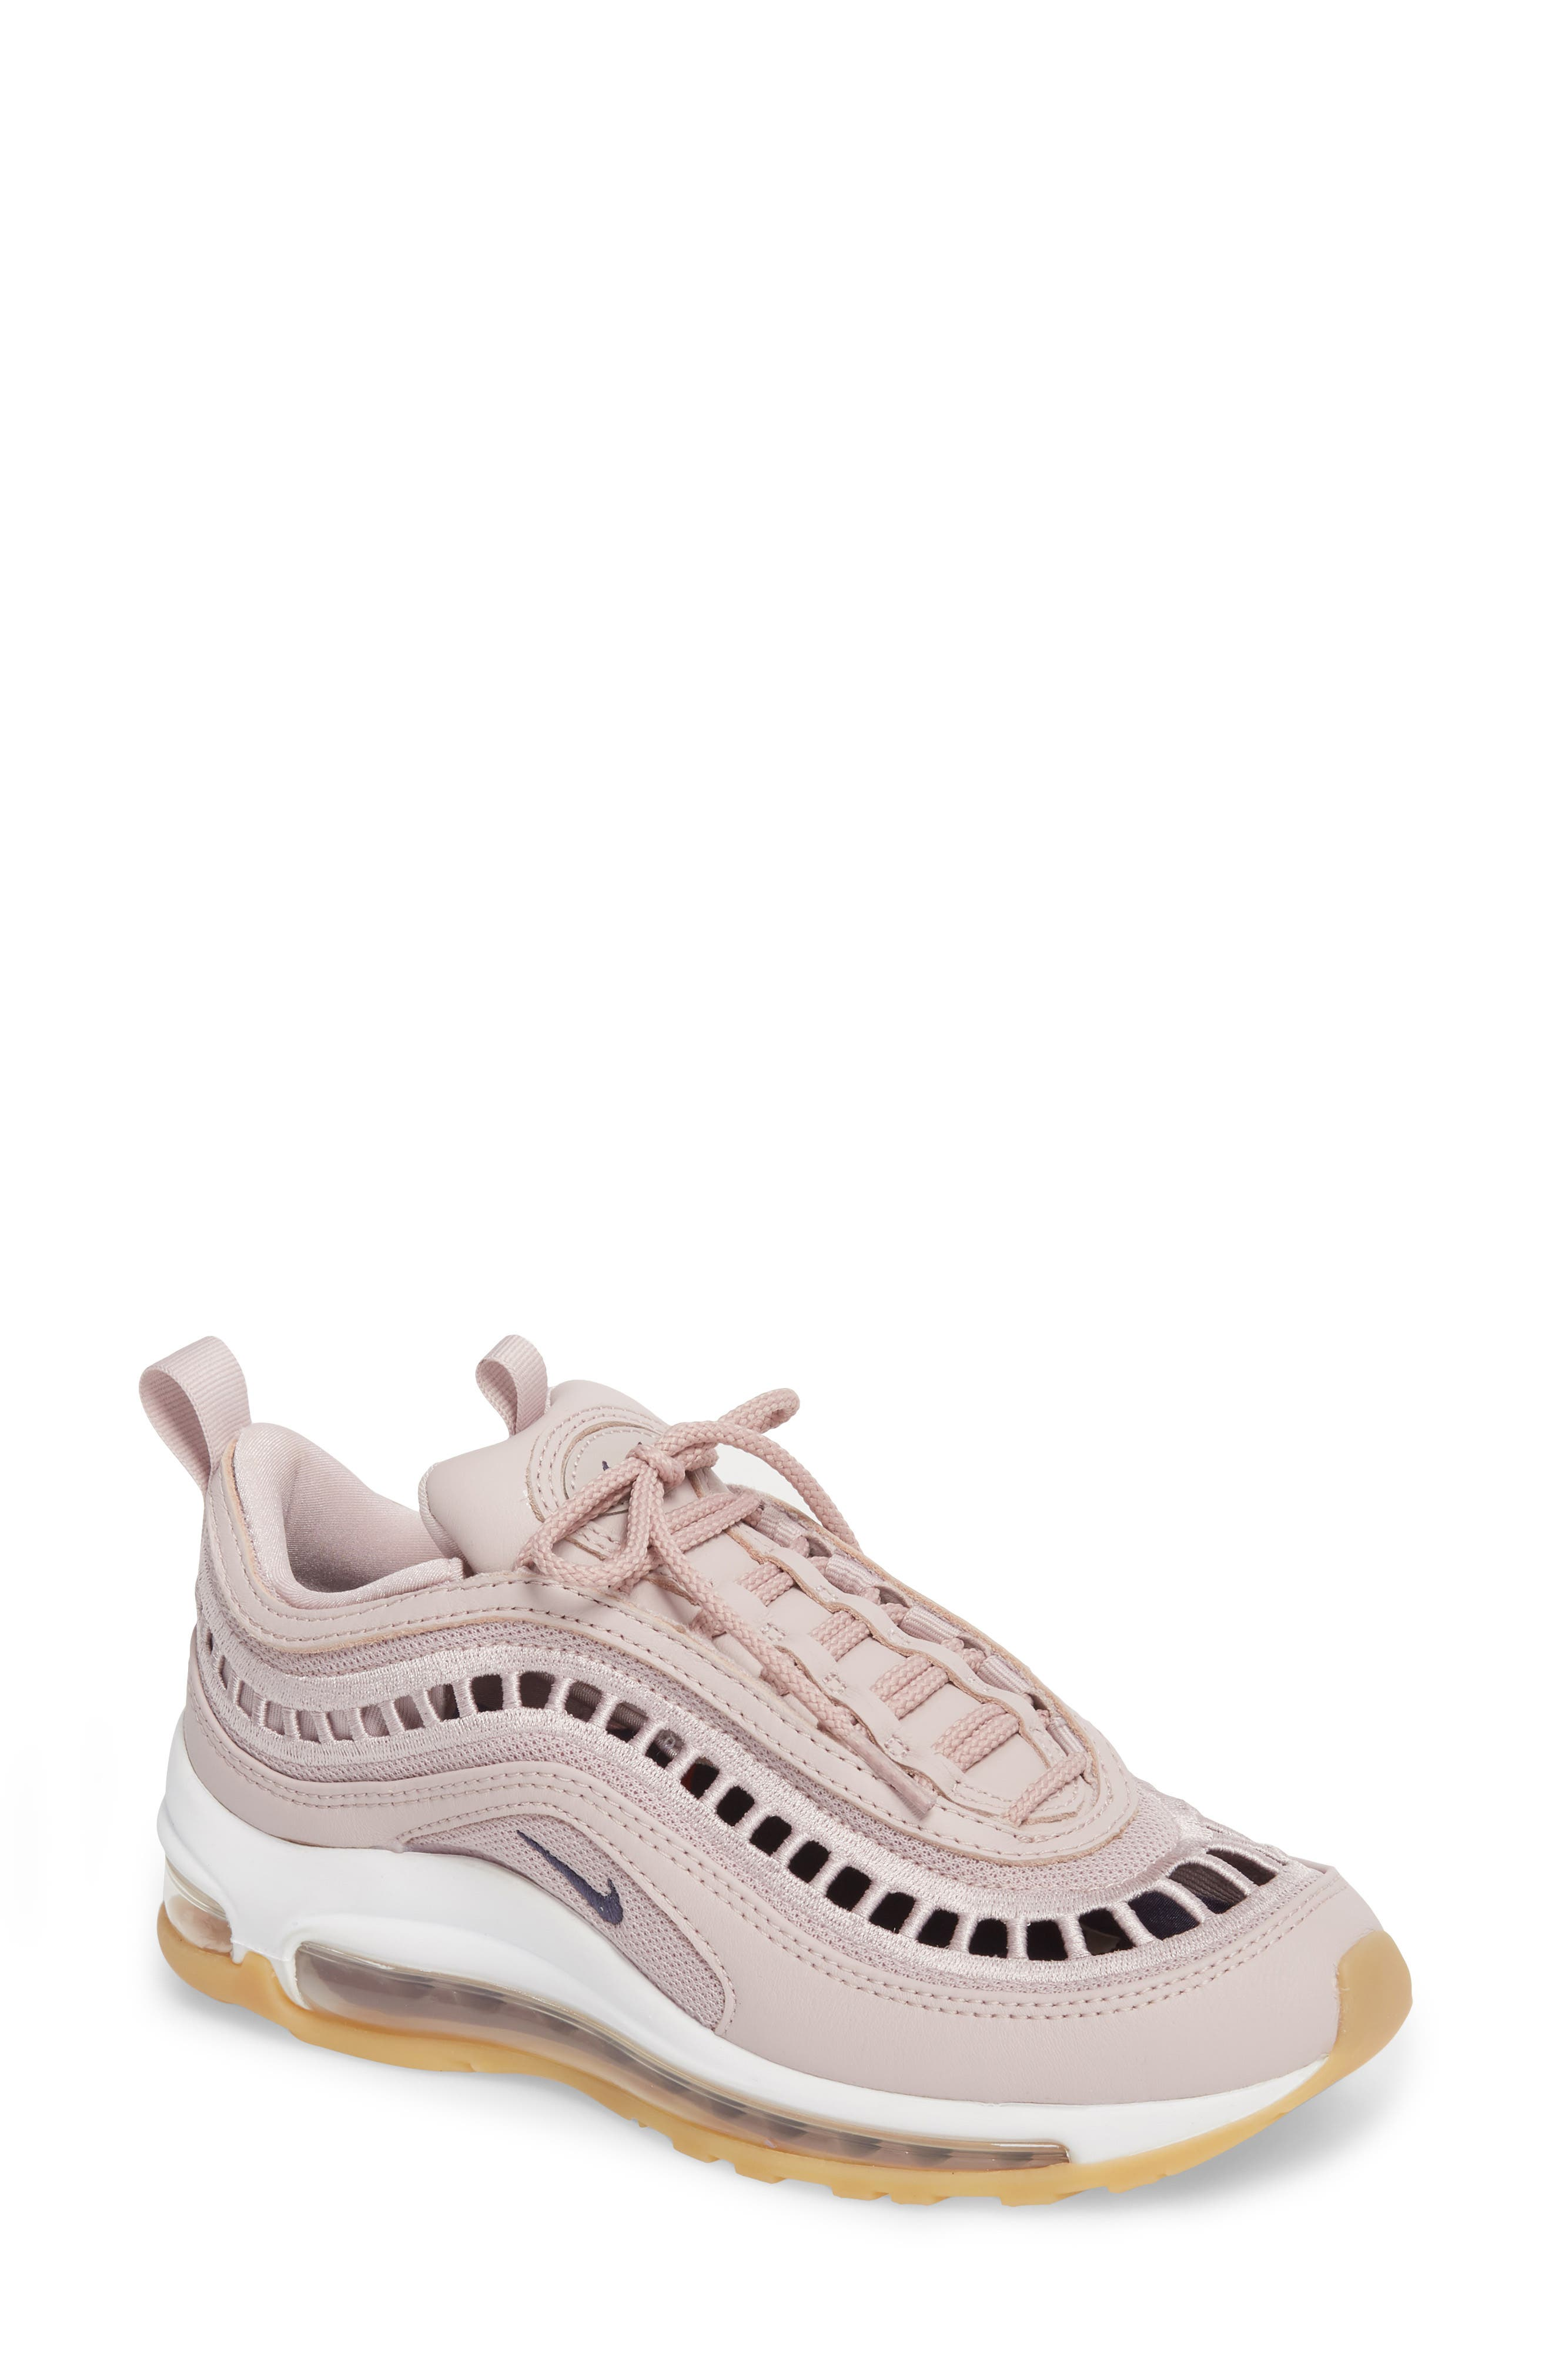 Air Max 97 Ultra '17 SI Sneaker,                             Main thumbnail 1, color,                             Particle Rose/ Neutral Indigo